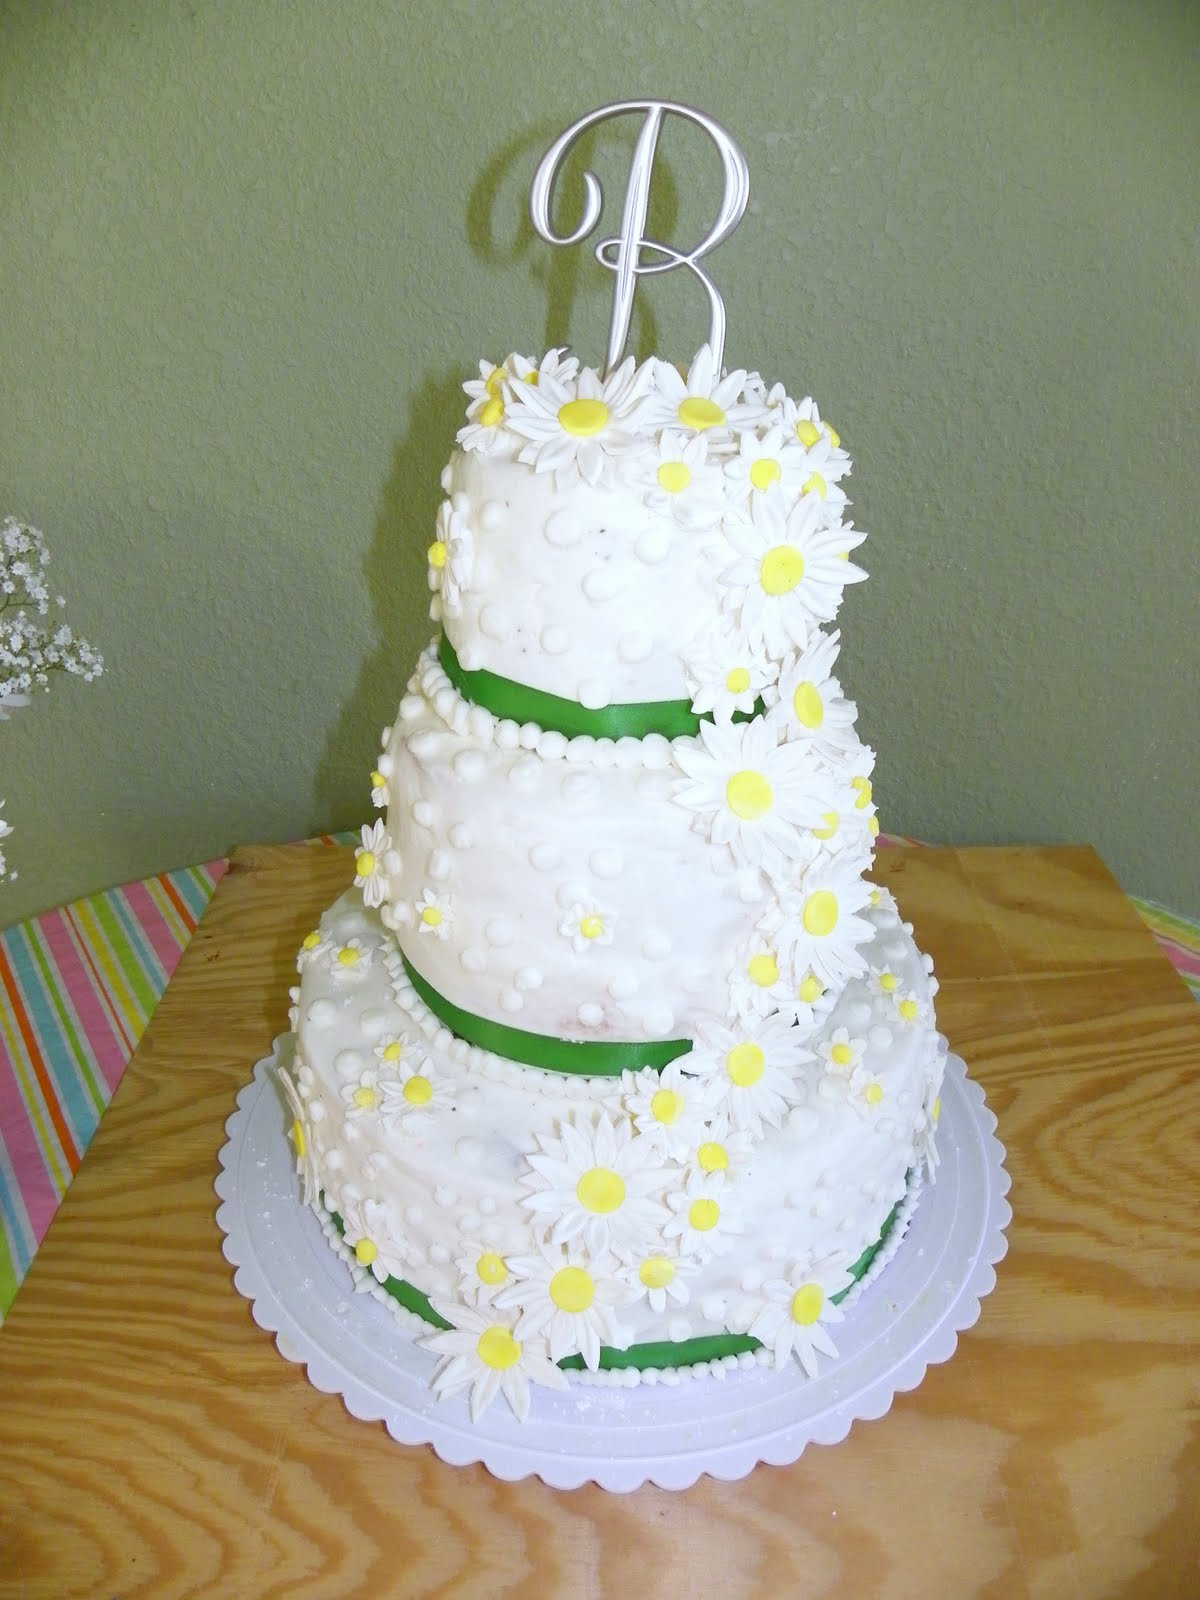 Michaelina s Cakes jojom333 yahoo Daisy Wedding Cake